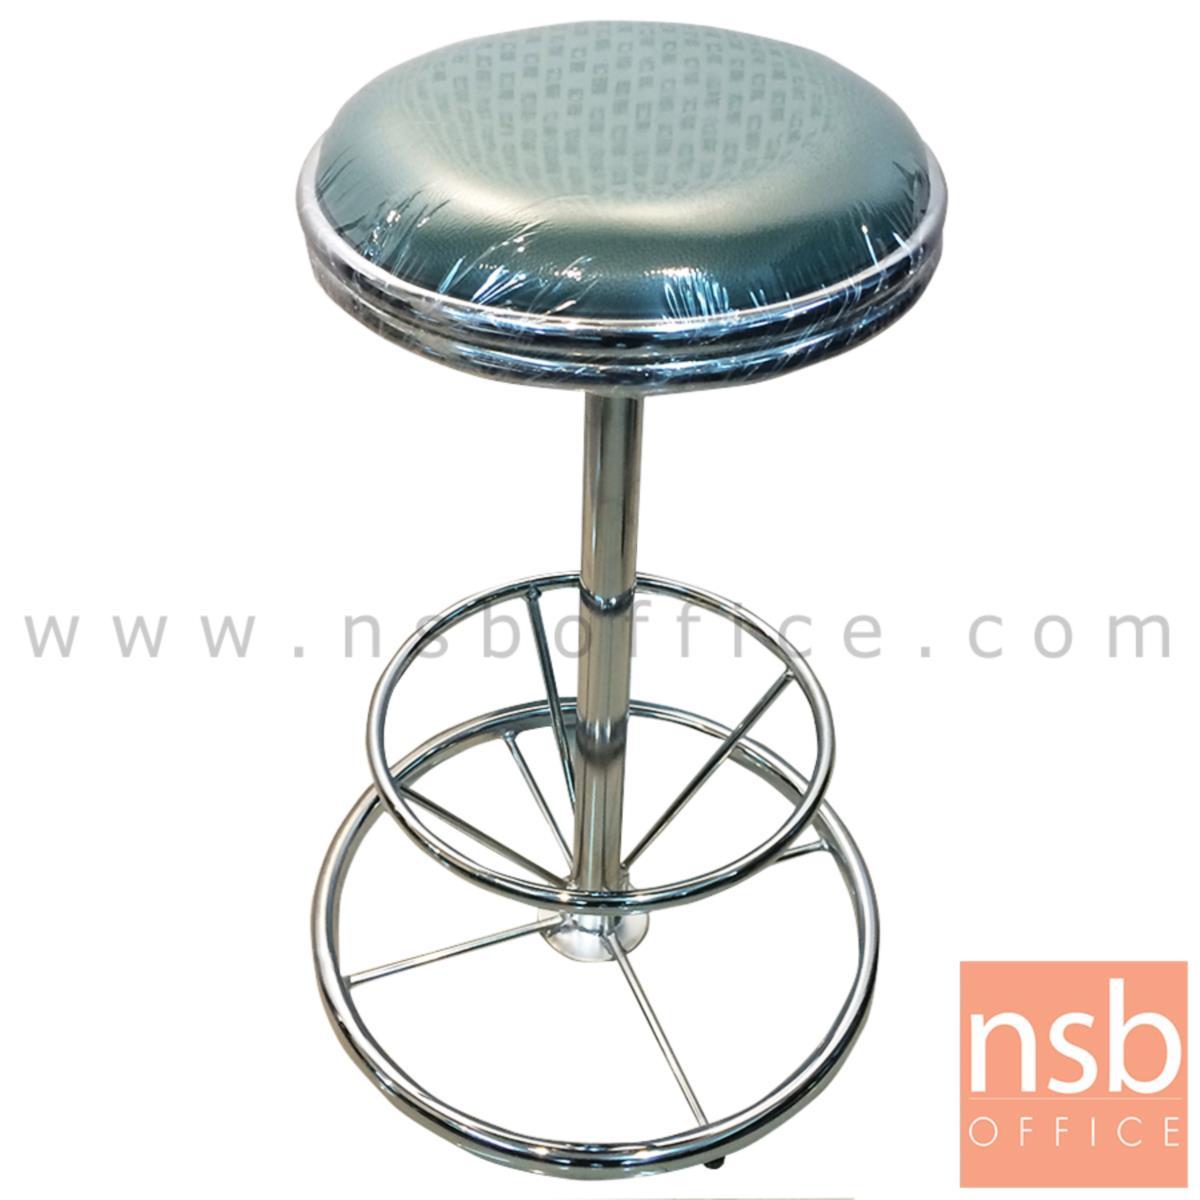 B09A016:เก้าอี้บาร์สตูลที่นั่งกลม รุ่น CS-001 ขาเหล็ก